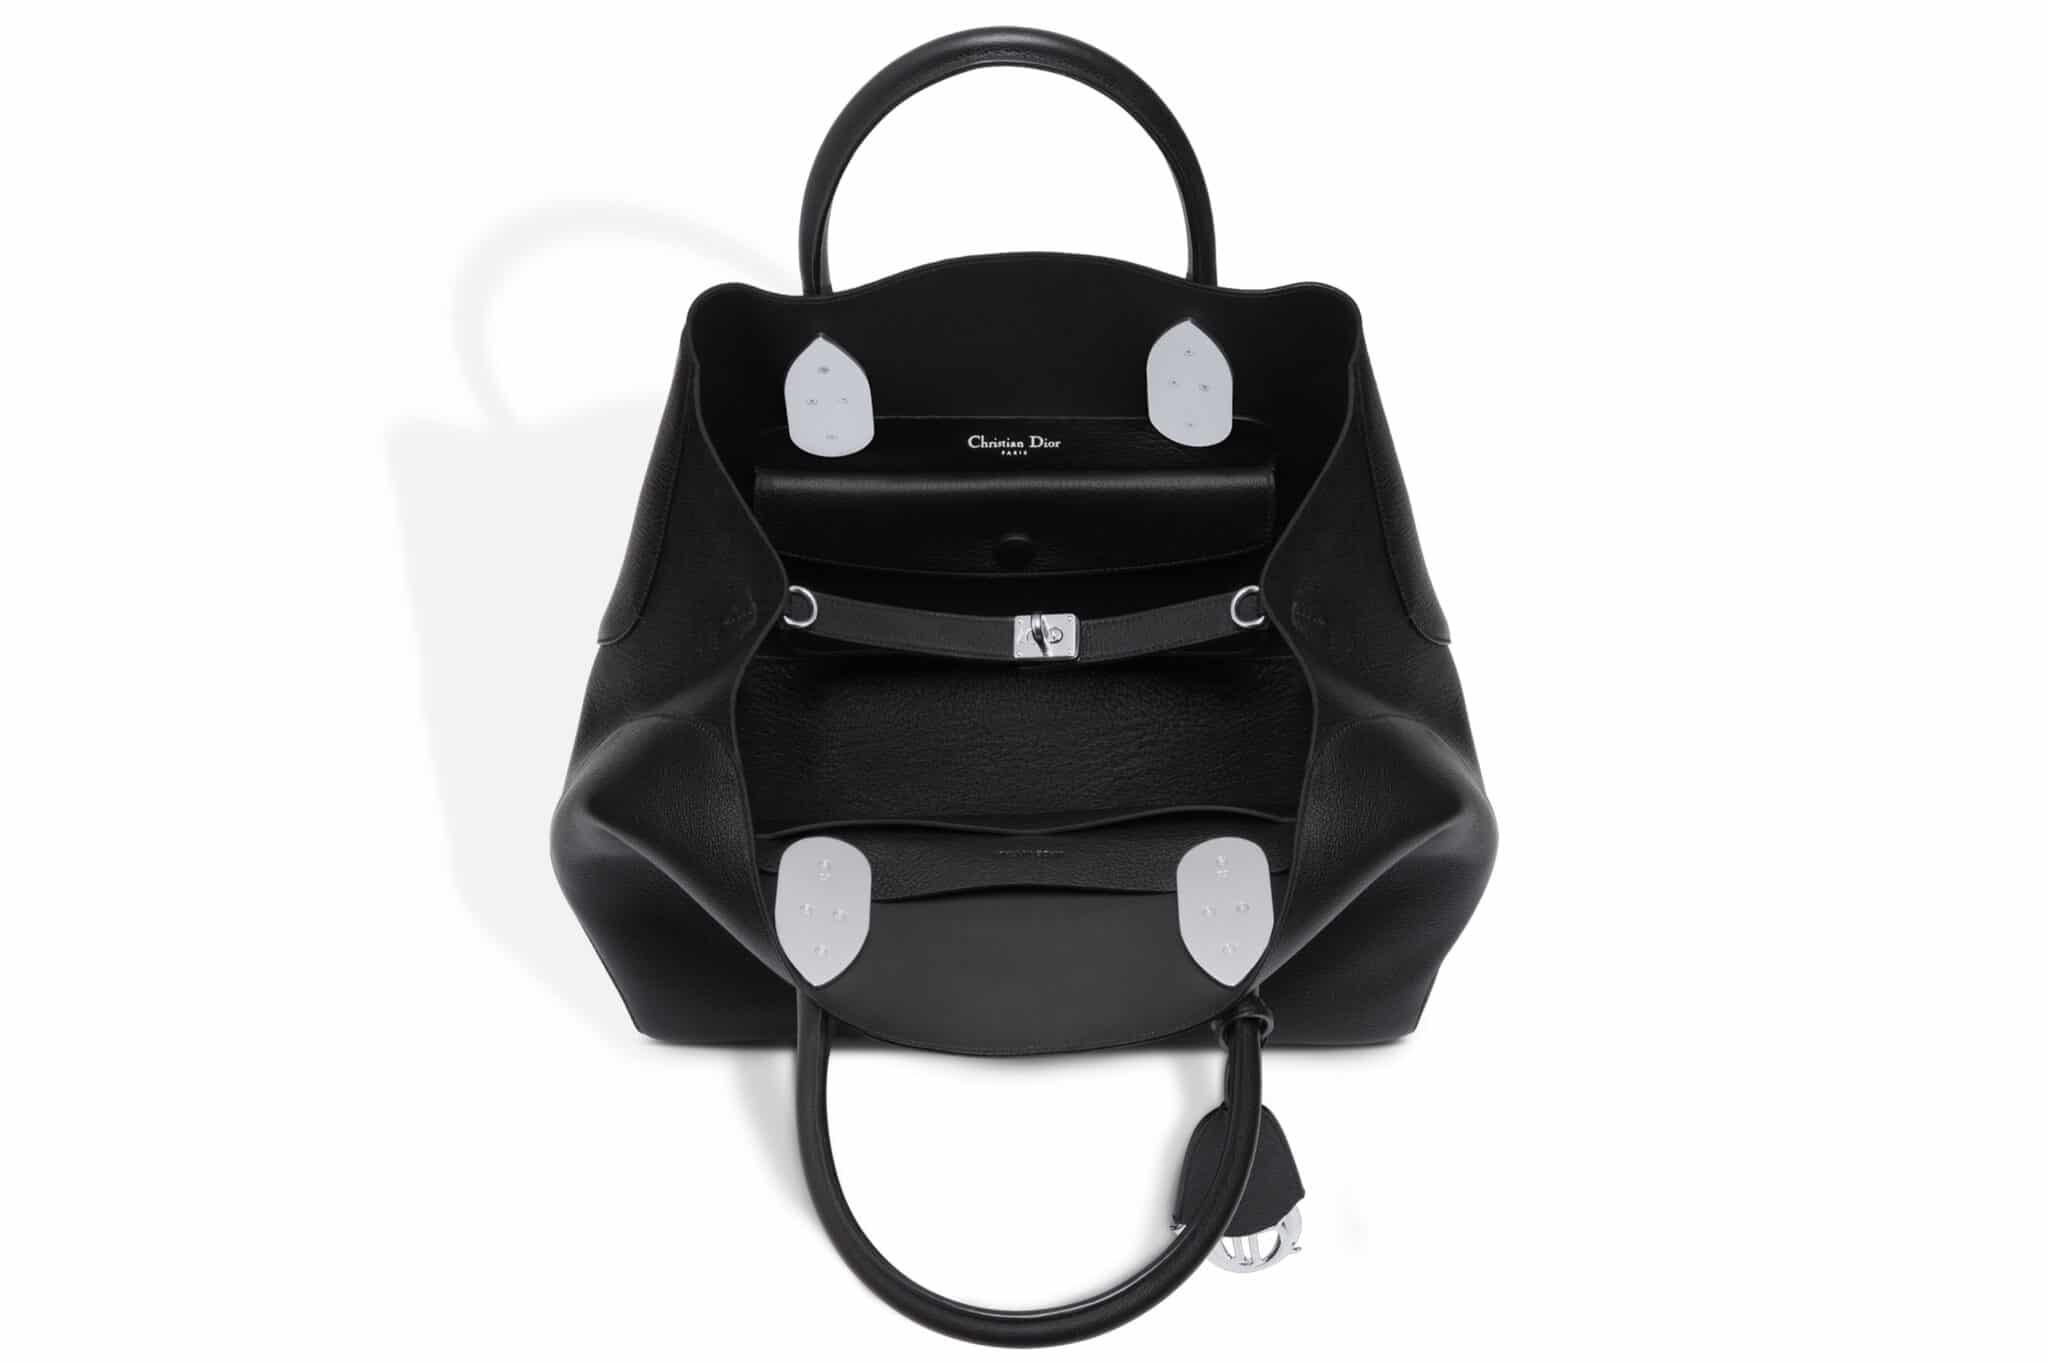 Image Result For Black Leather Tote Bag